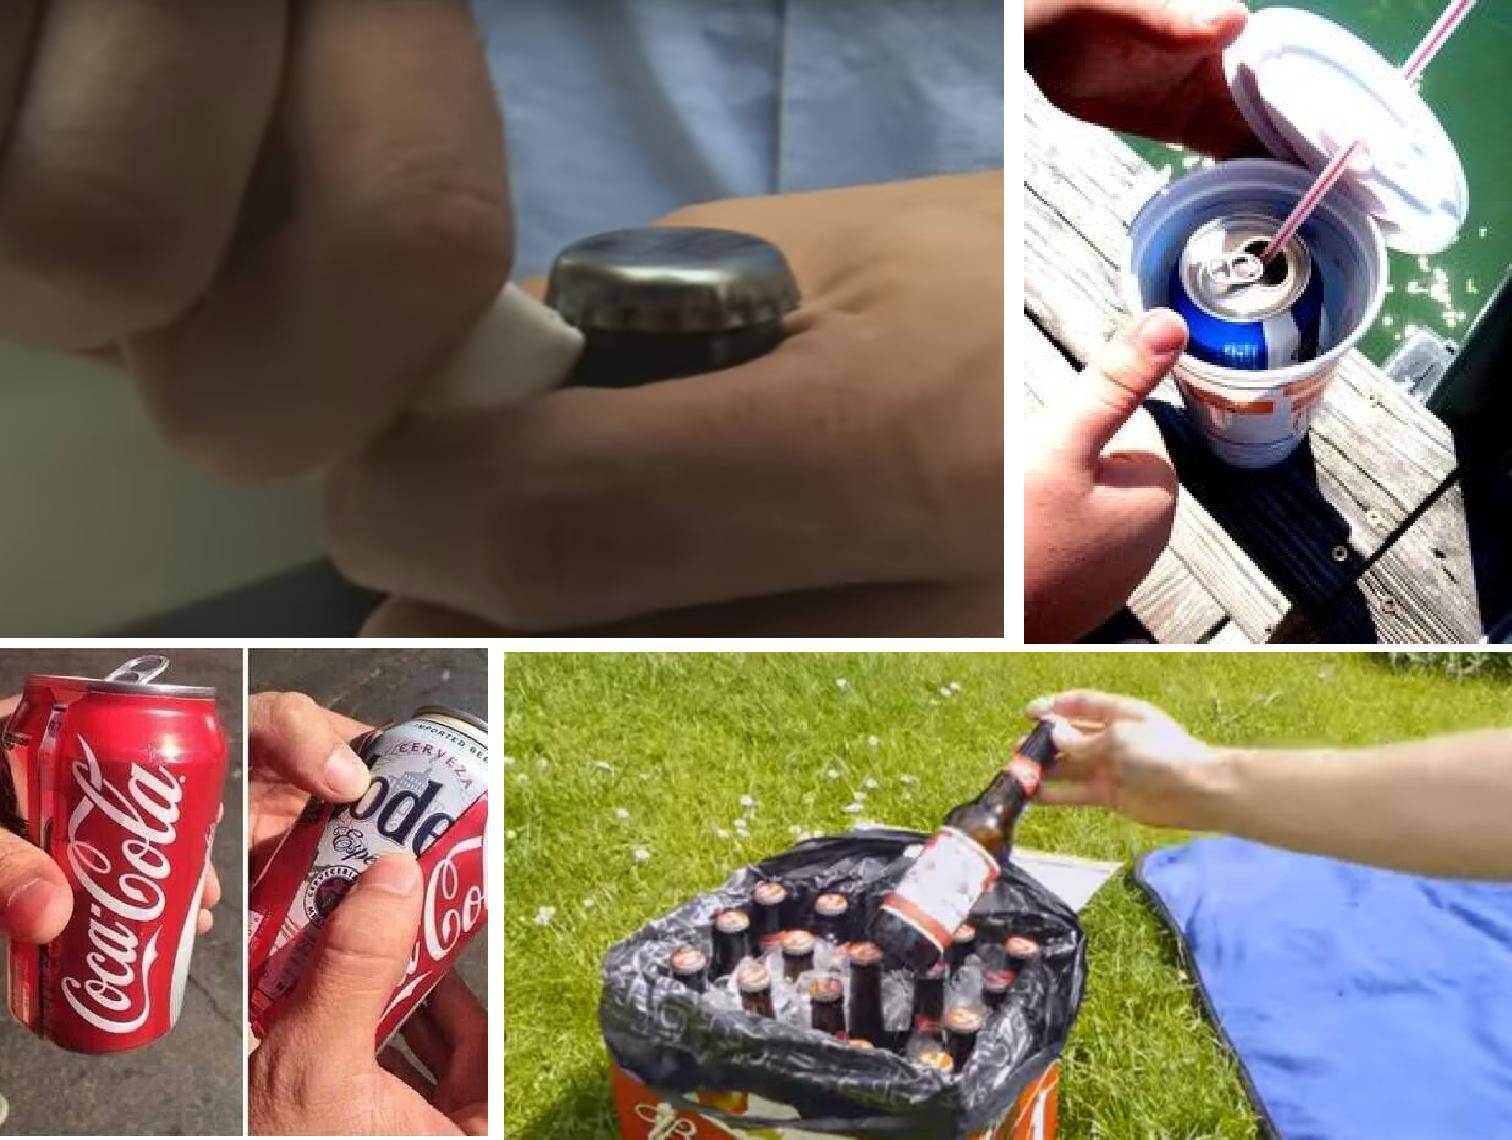 Trikovi: Otvorite pivo papirom, napravite vlastiti hladnjak...